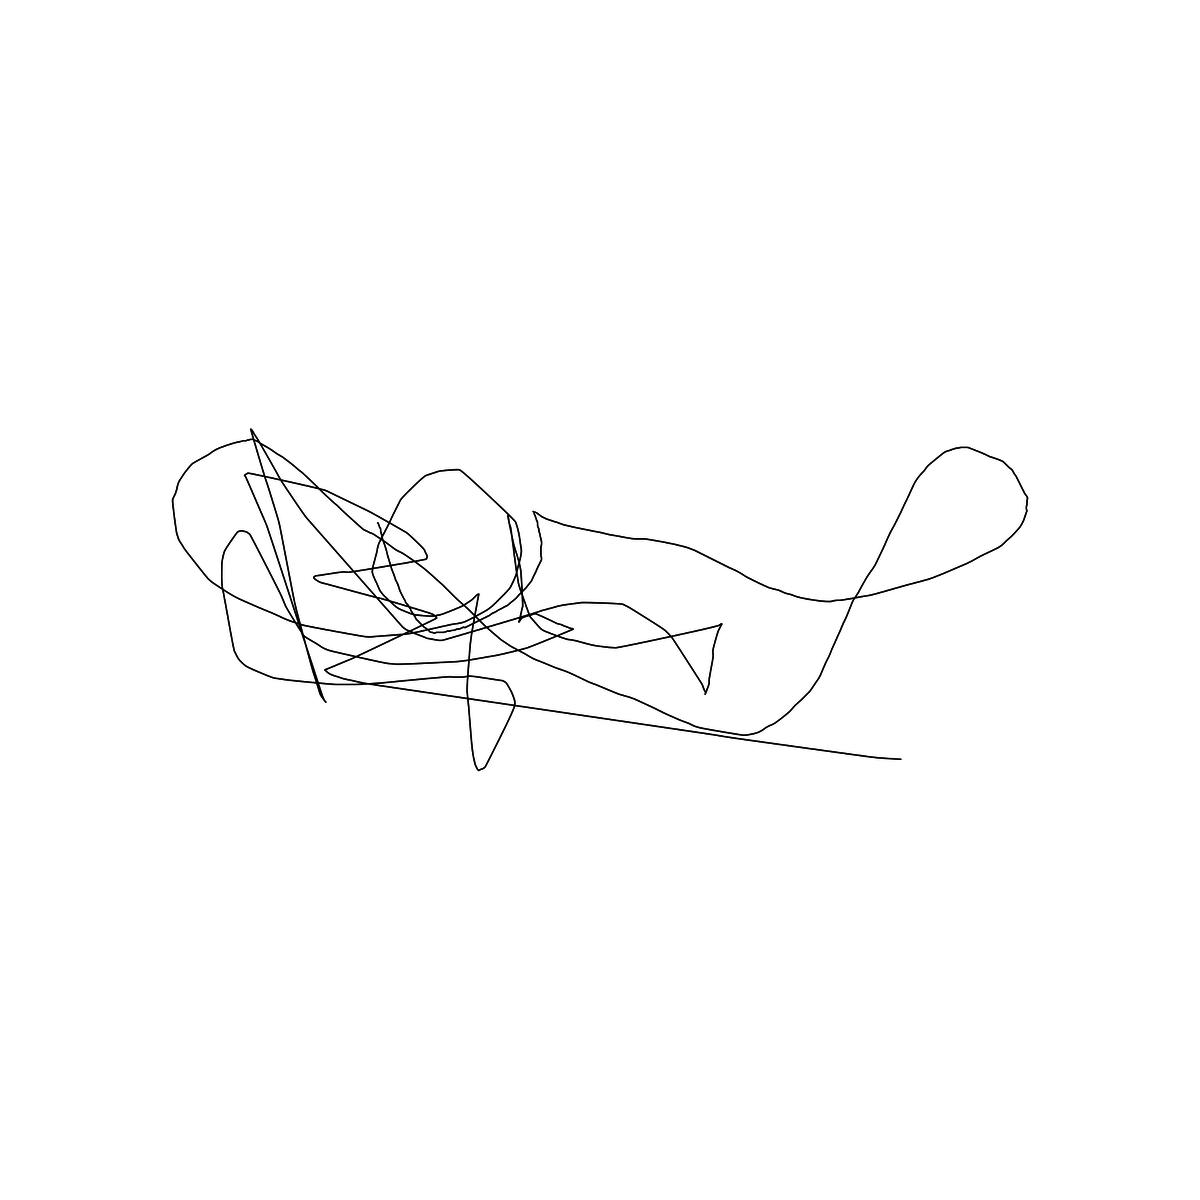 BAAAM drawing#19377 lat:-6.2668681144714355lng: 106.6562805175781200